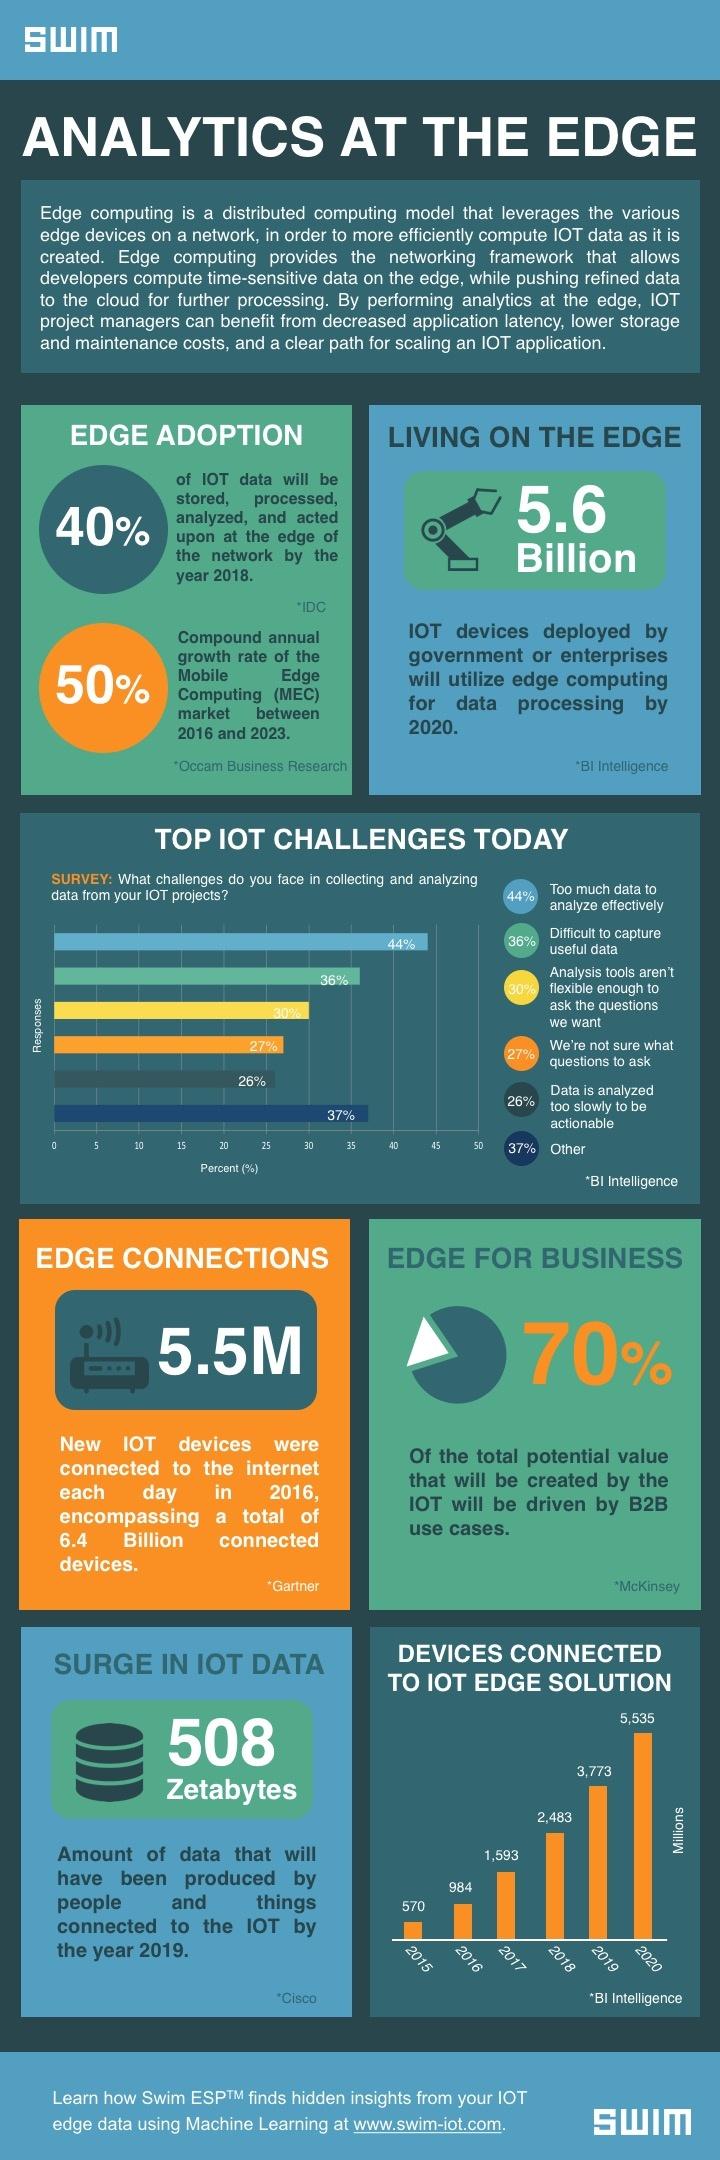 Swim_Analytics at the Edge_Infographic